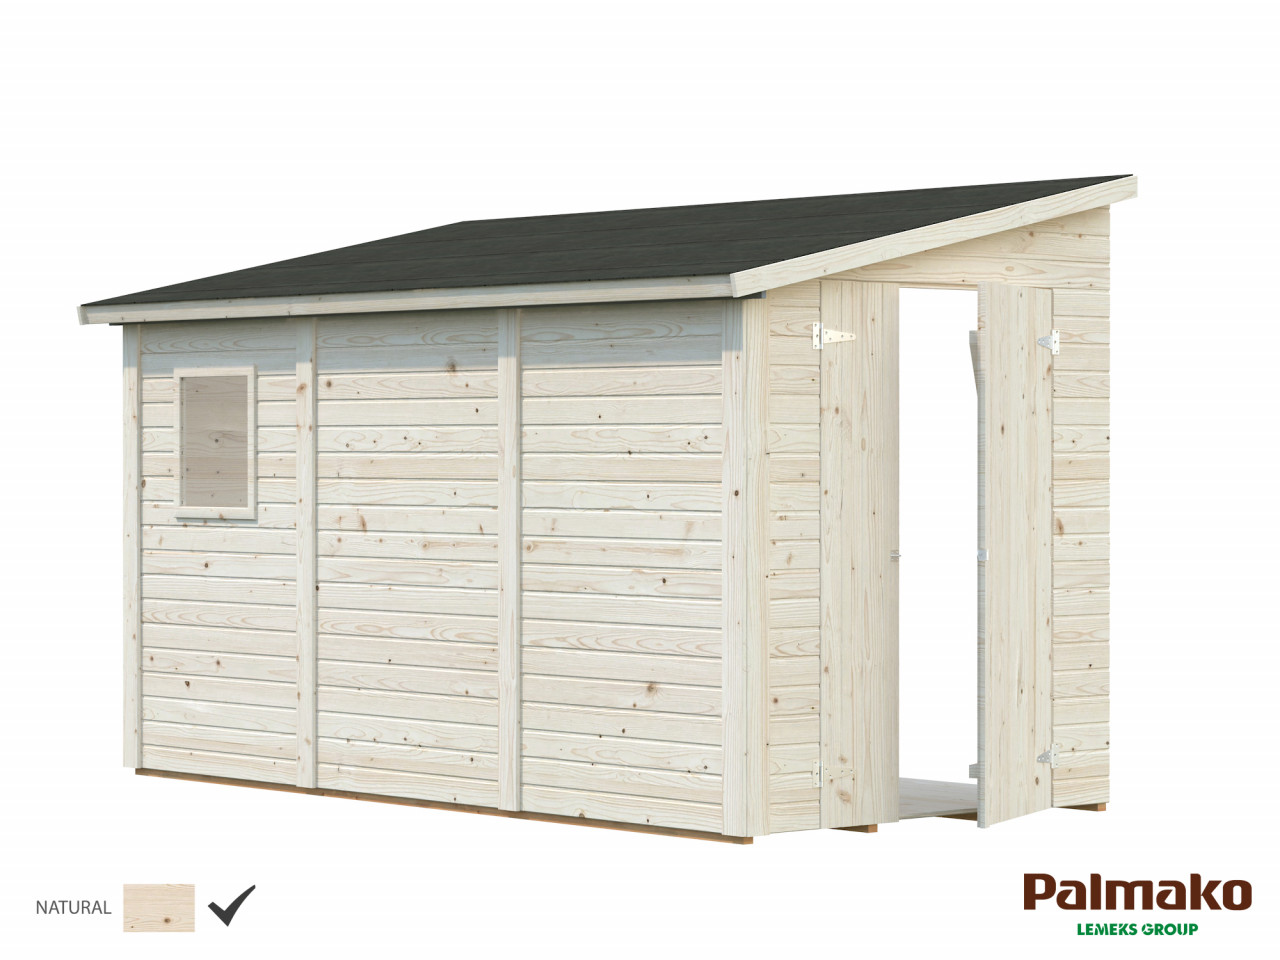 Palmako Gerätehaus Mia 5,4 m²